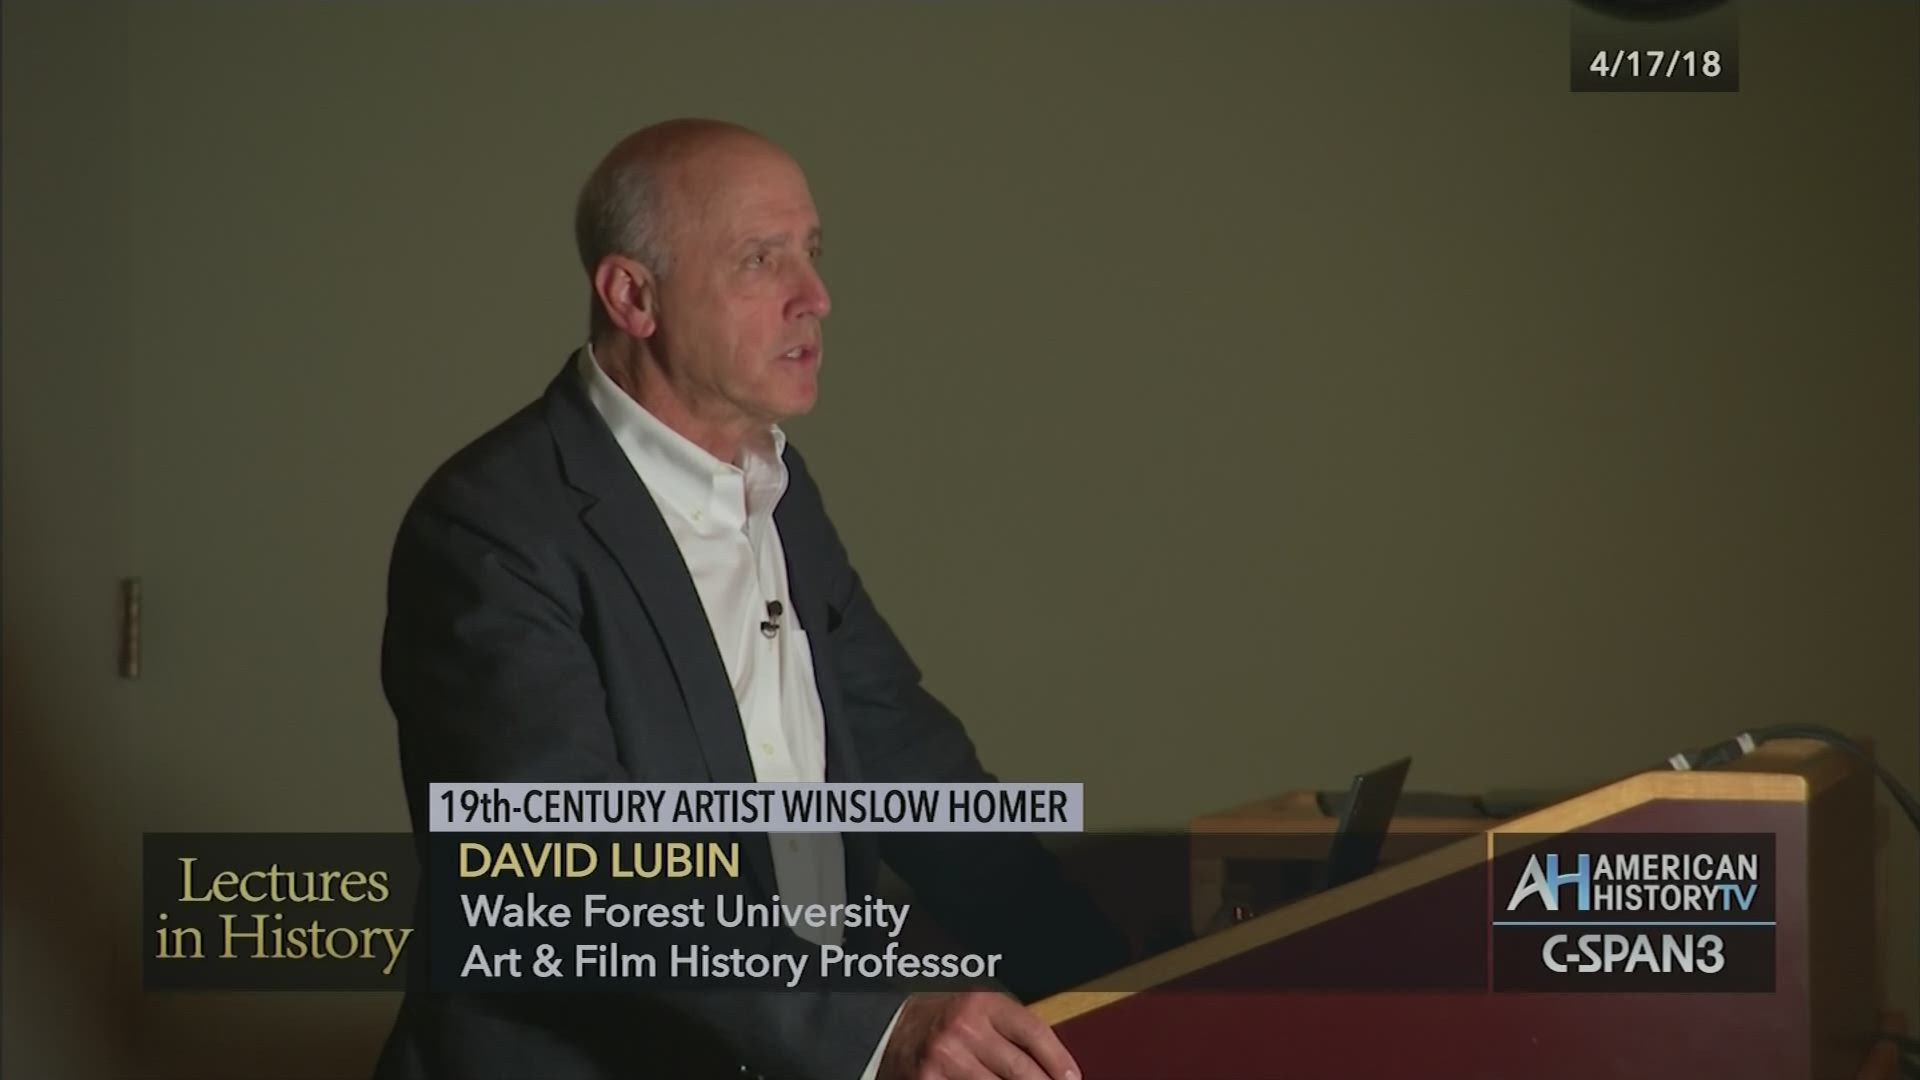 19th Century Artist Winslow Homer Apr 17 2018 Video C Span